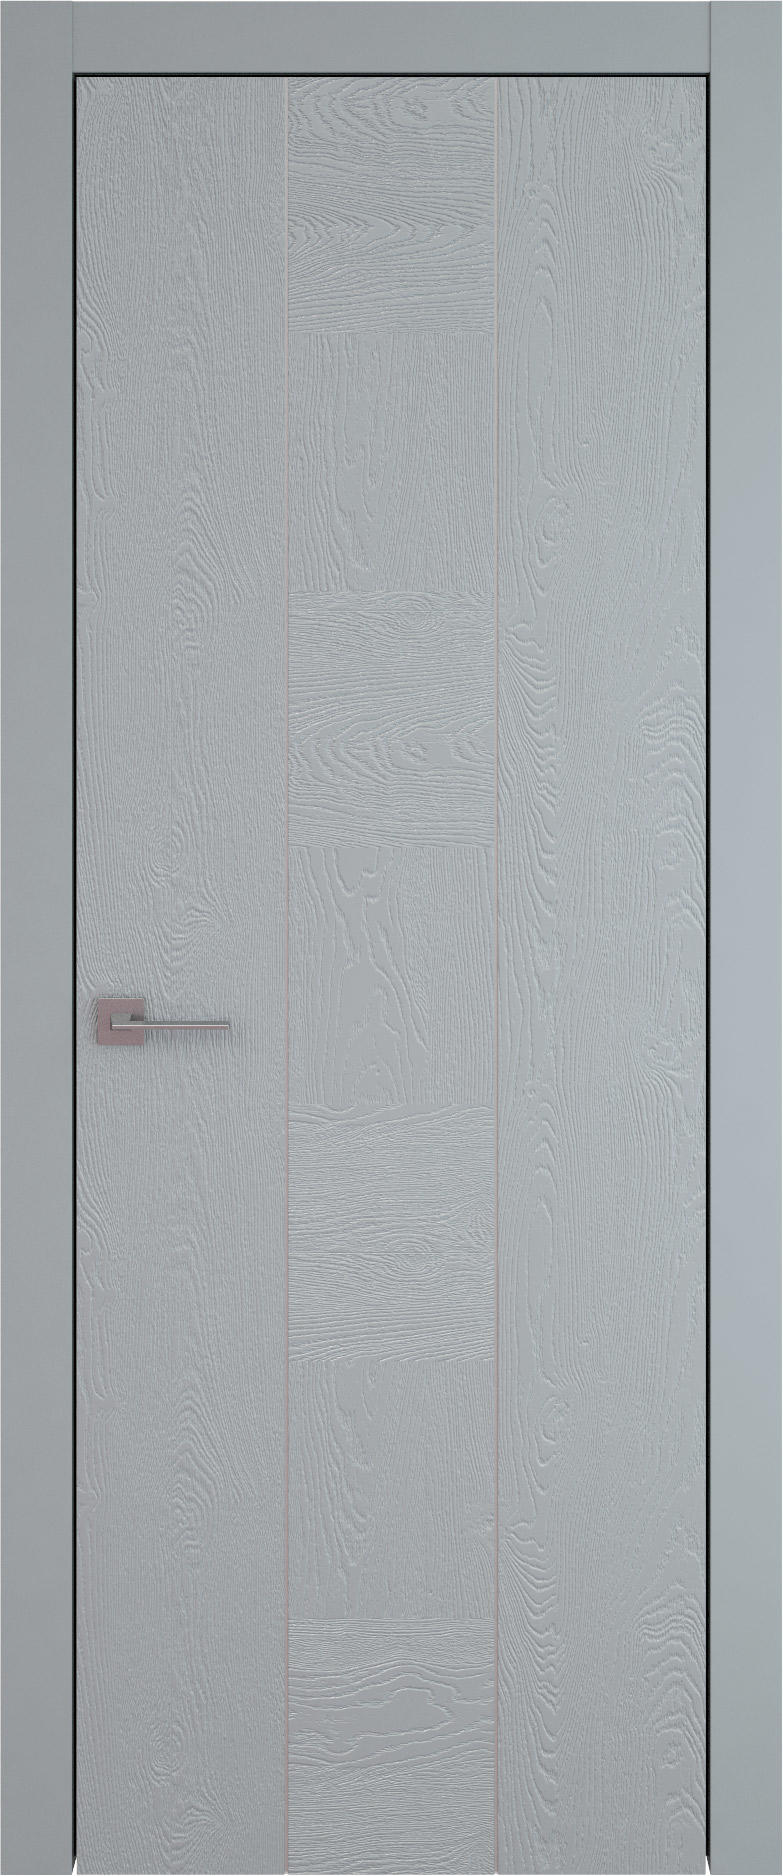 Tivoli Б-1 цвет - Серебристо-серая эмаль по шпону (RAL 7045) Без стекла (ДГ)